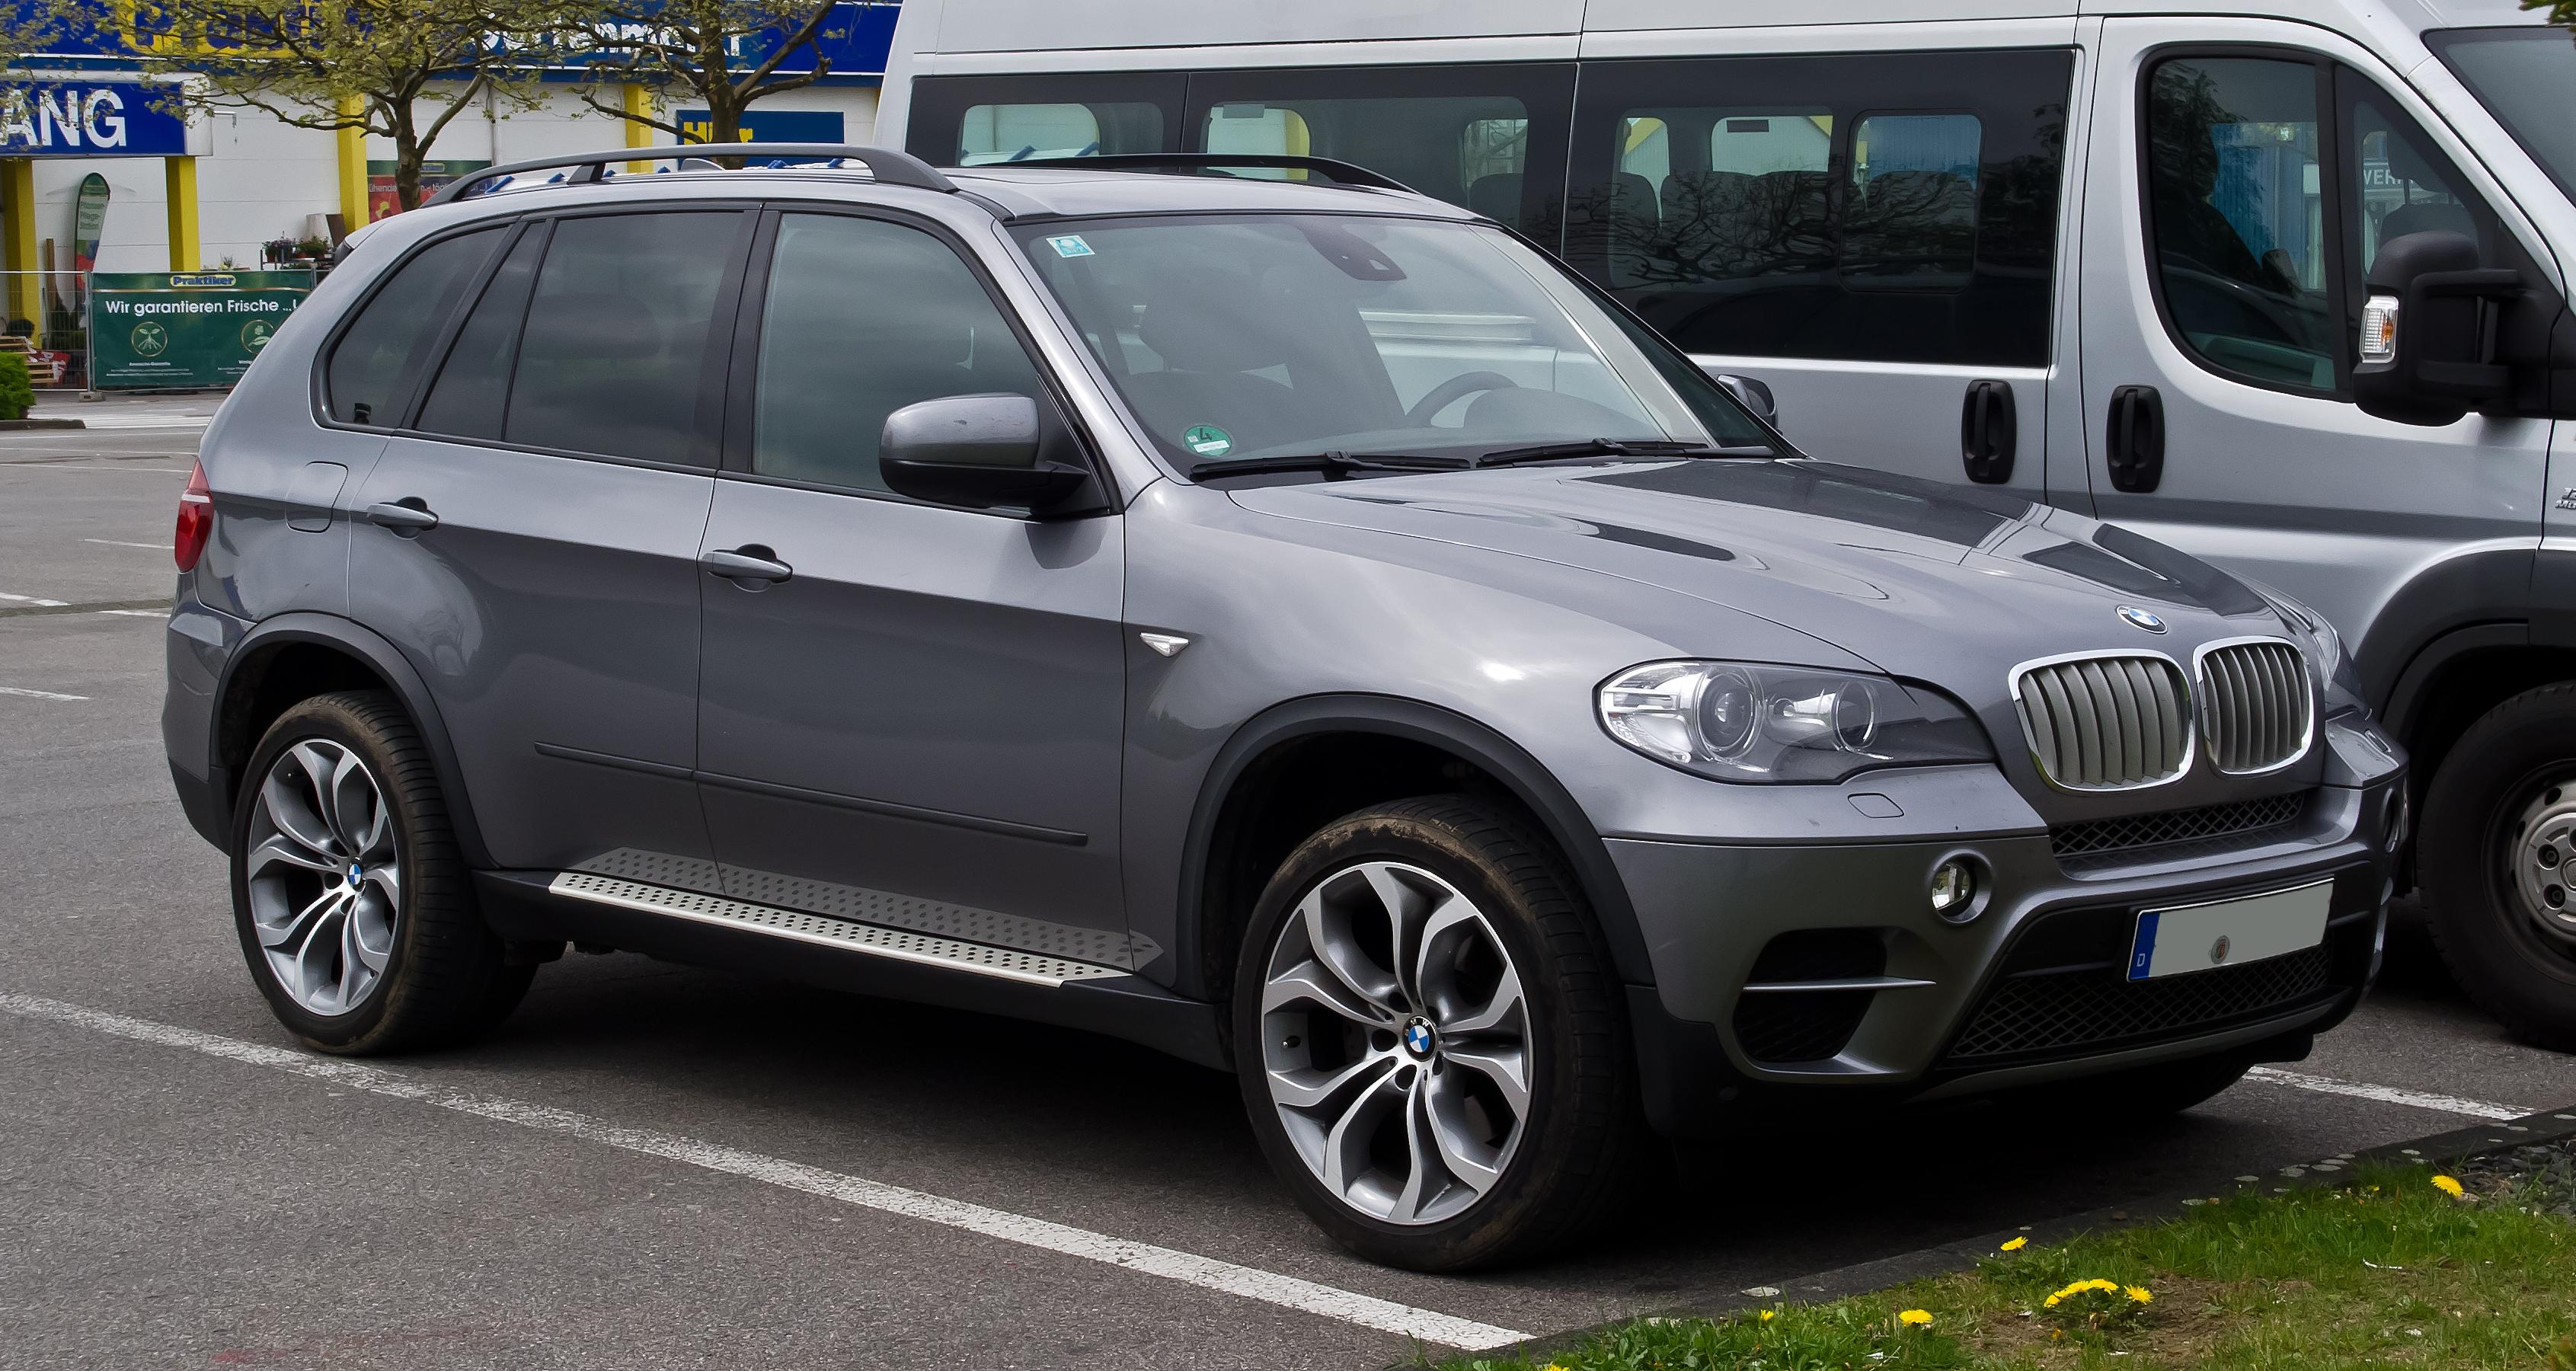 File:BMW X5 (E70, Facelift) - Frontansicht, 1. Mai 2012 ...